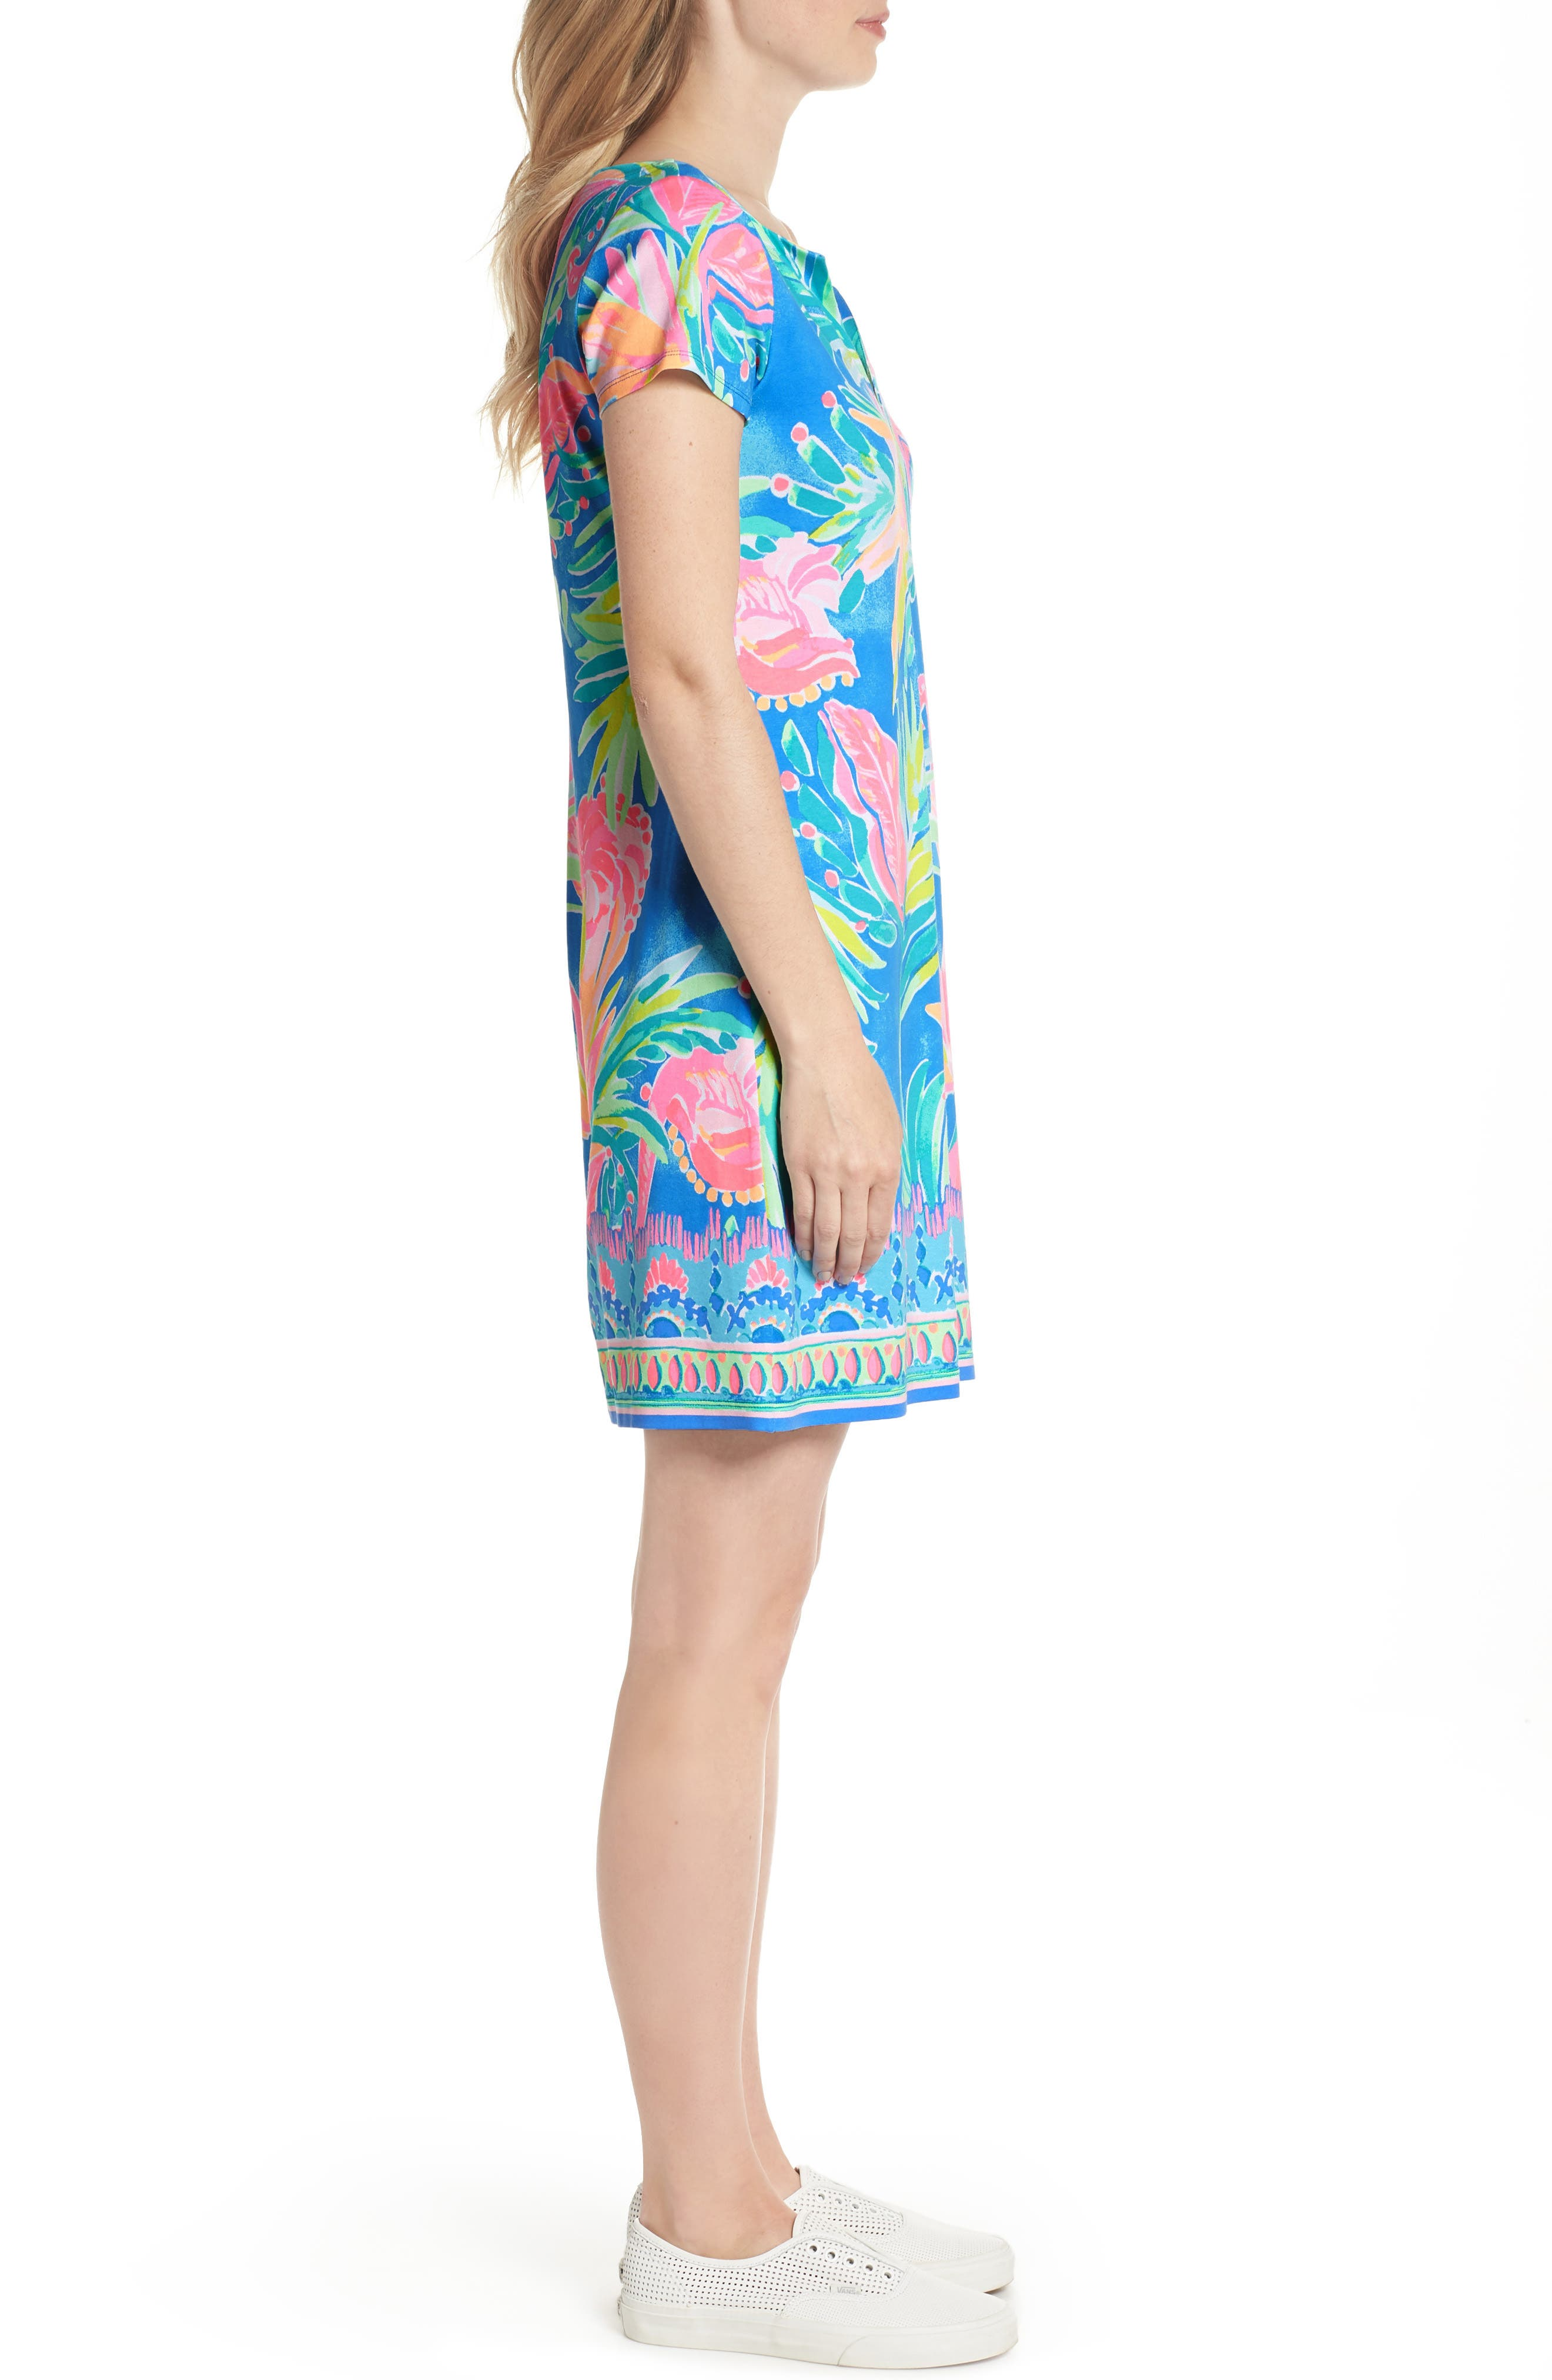 Sophiletta UPF 50+ Dress,                             Alternate thumbnail 3, color,                             420